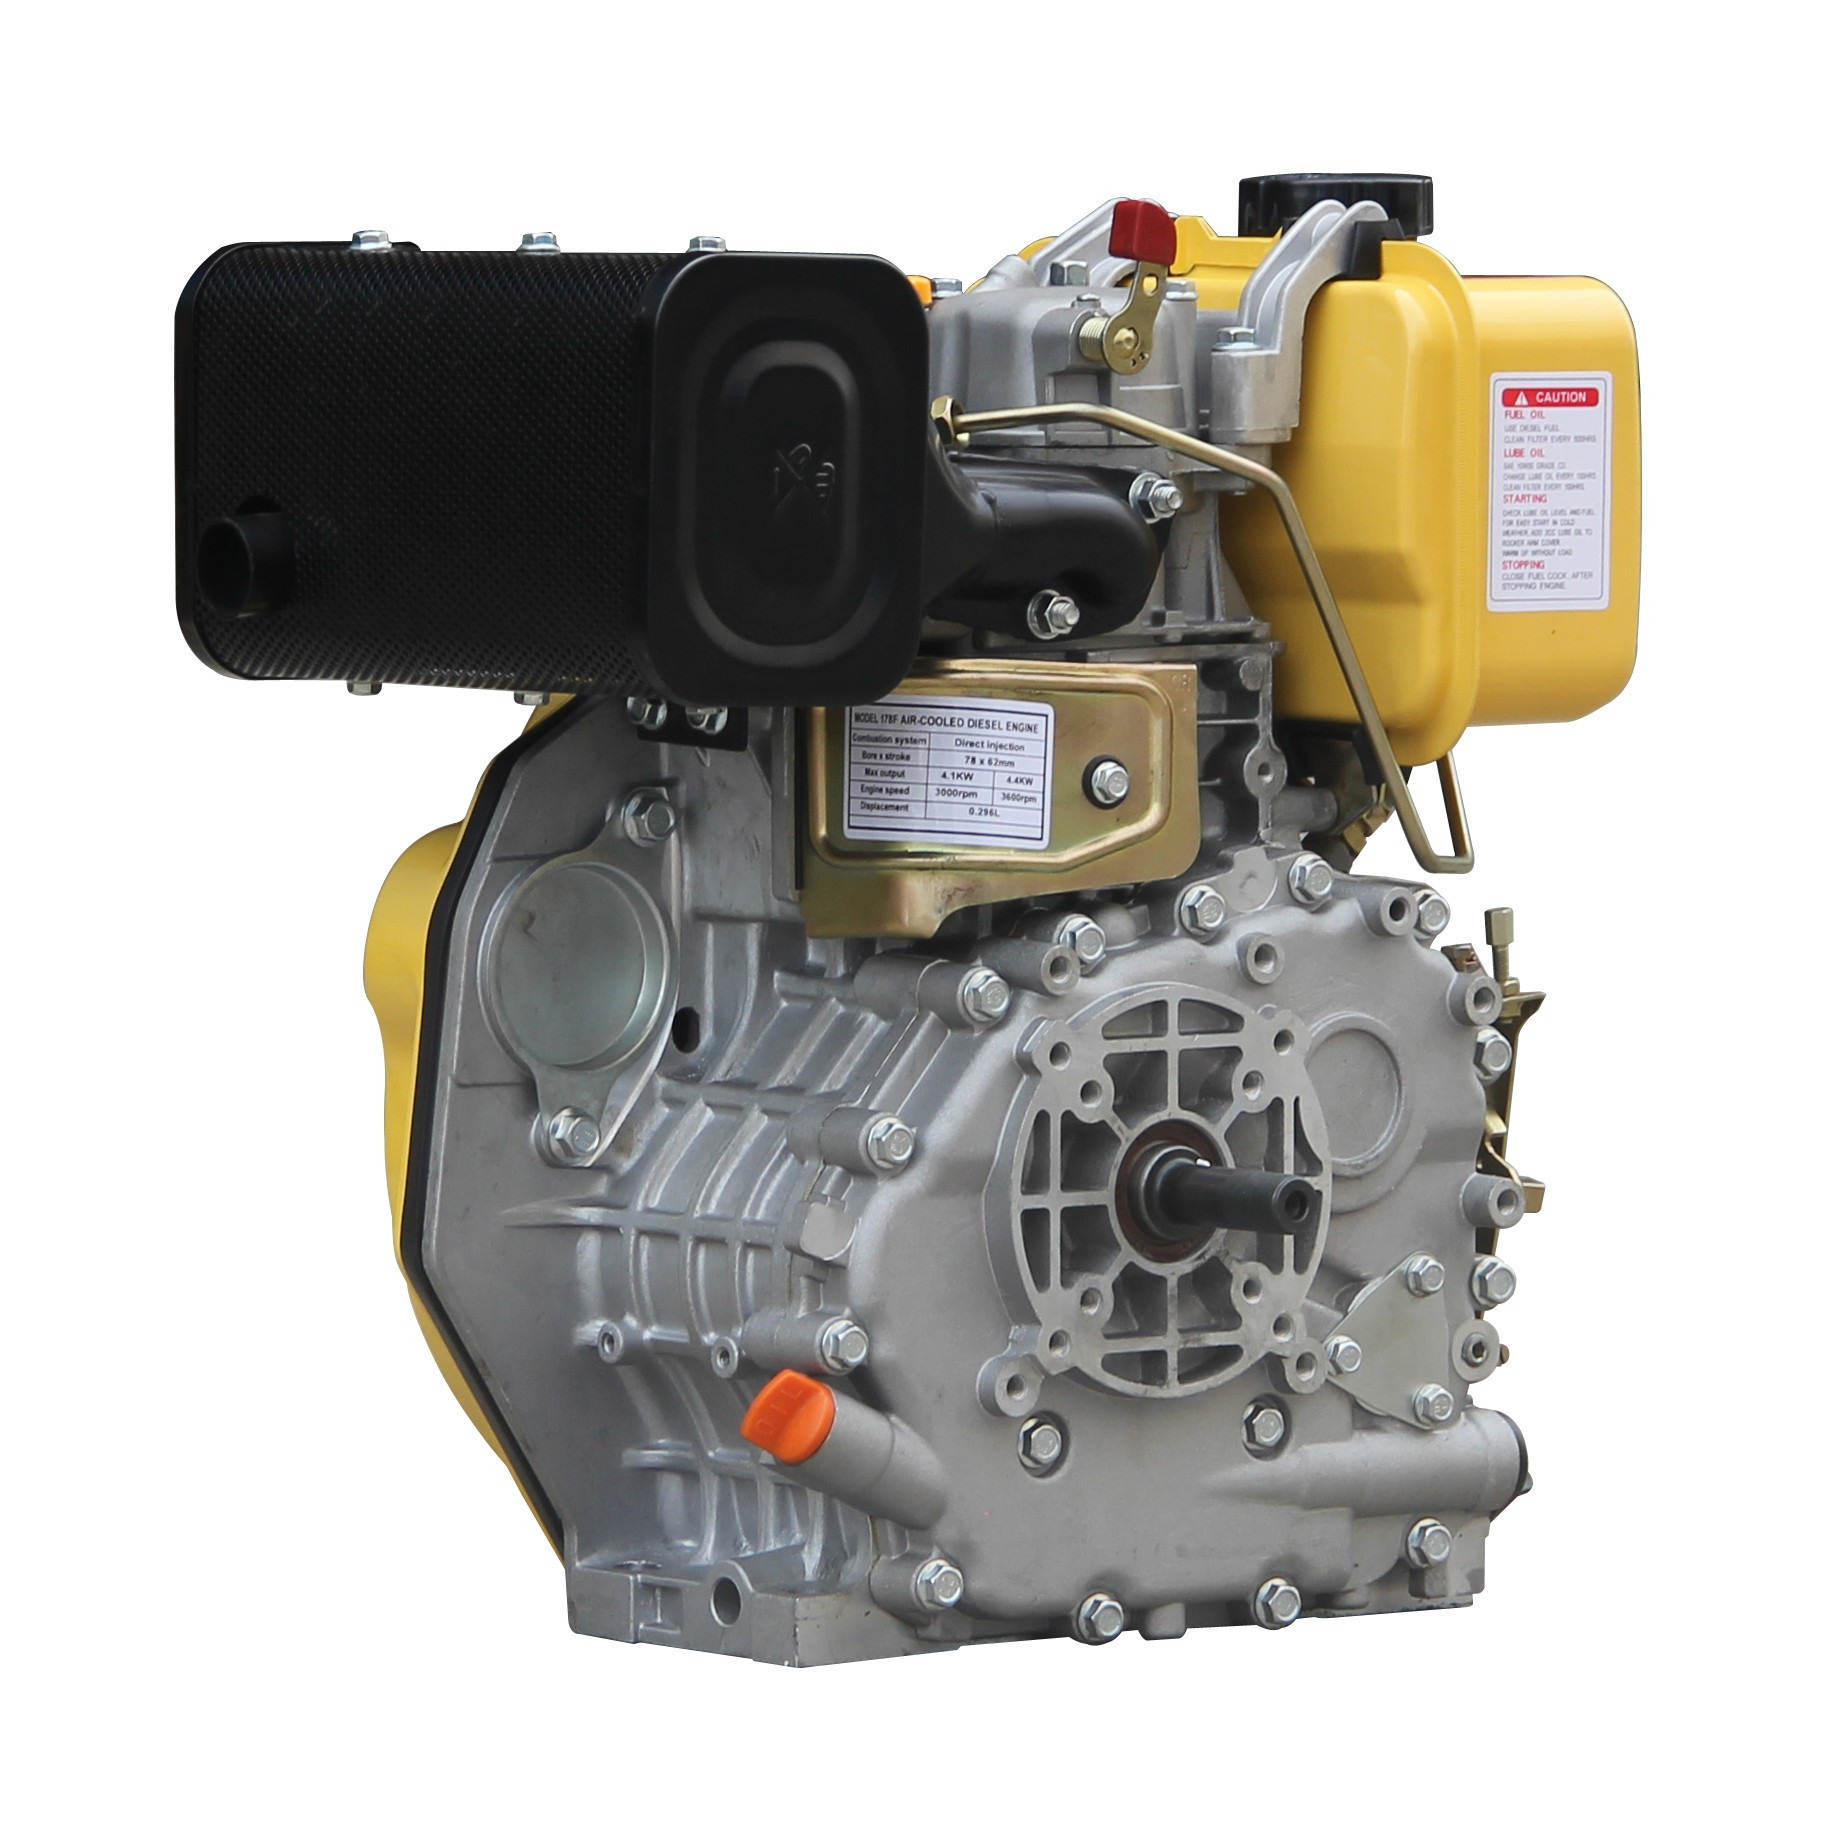 China Engine Diesel Engine 5kw 6 7HP Portable Diesel Engine Hot